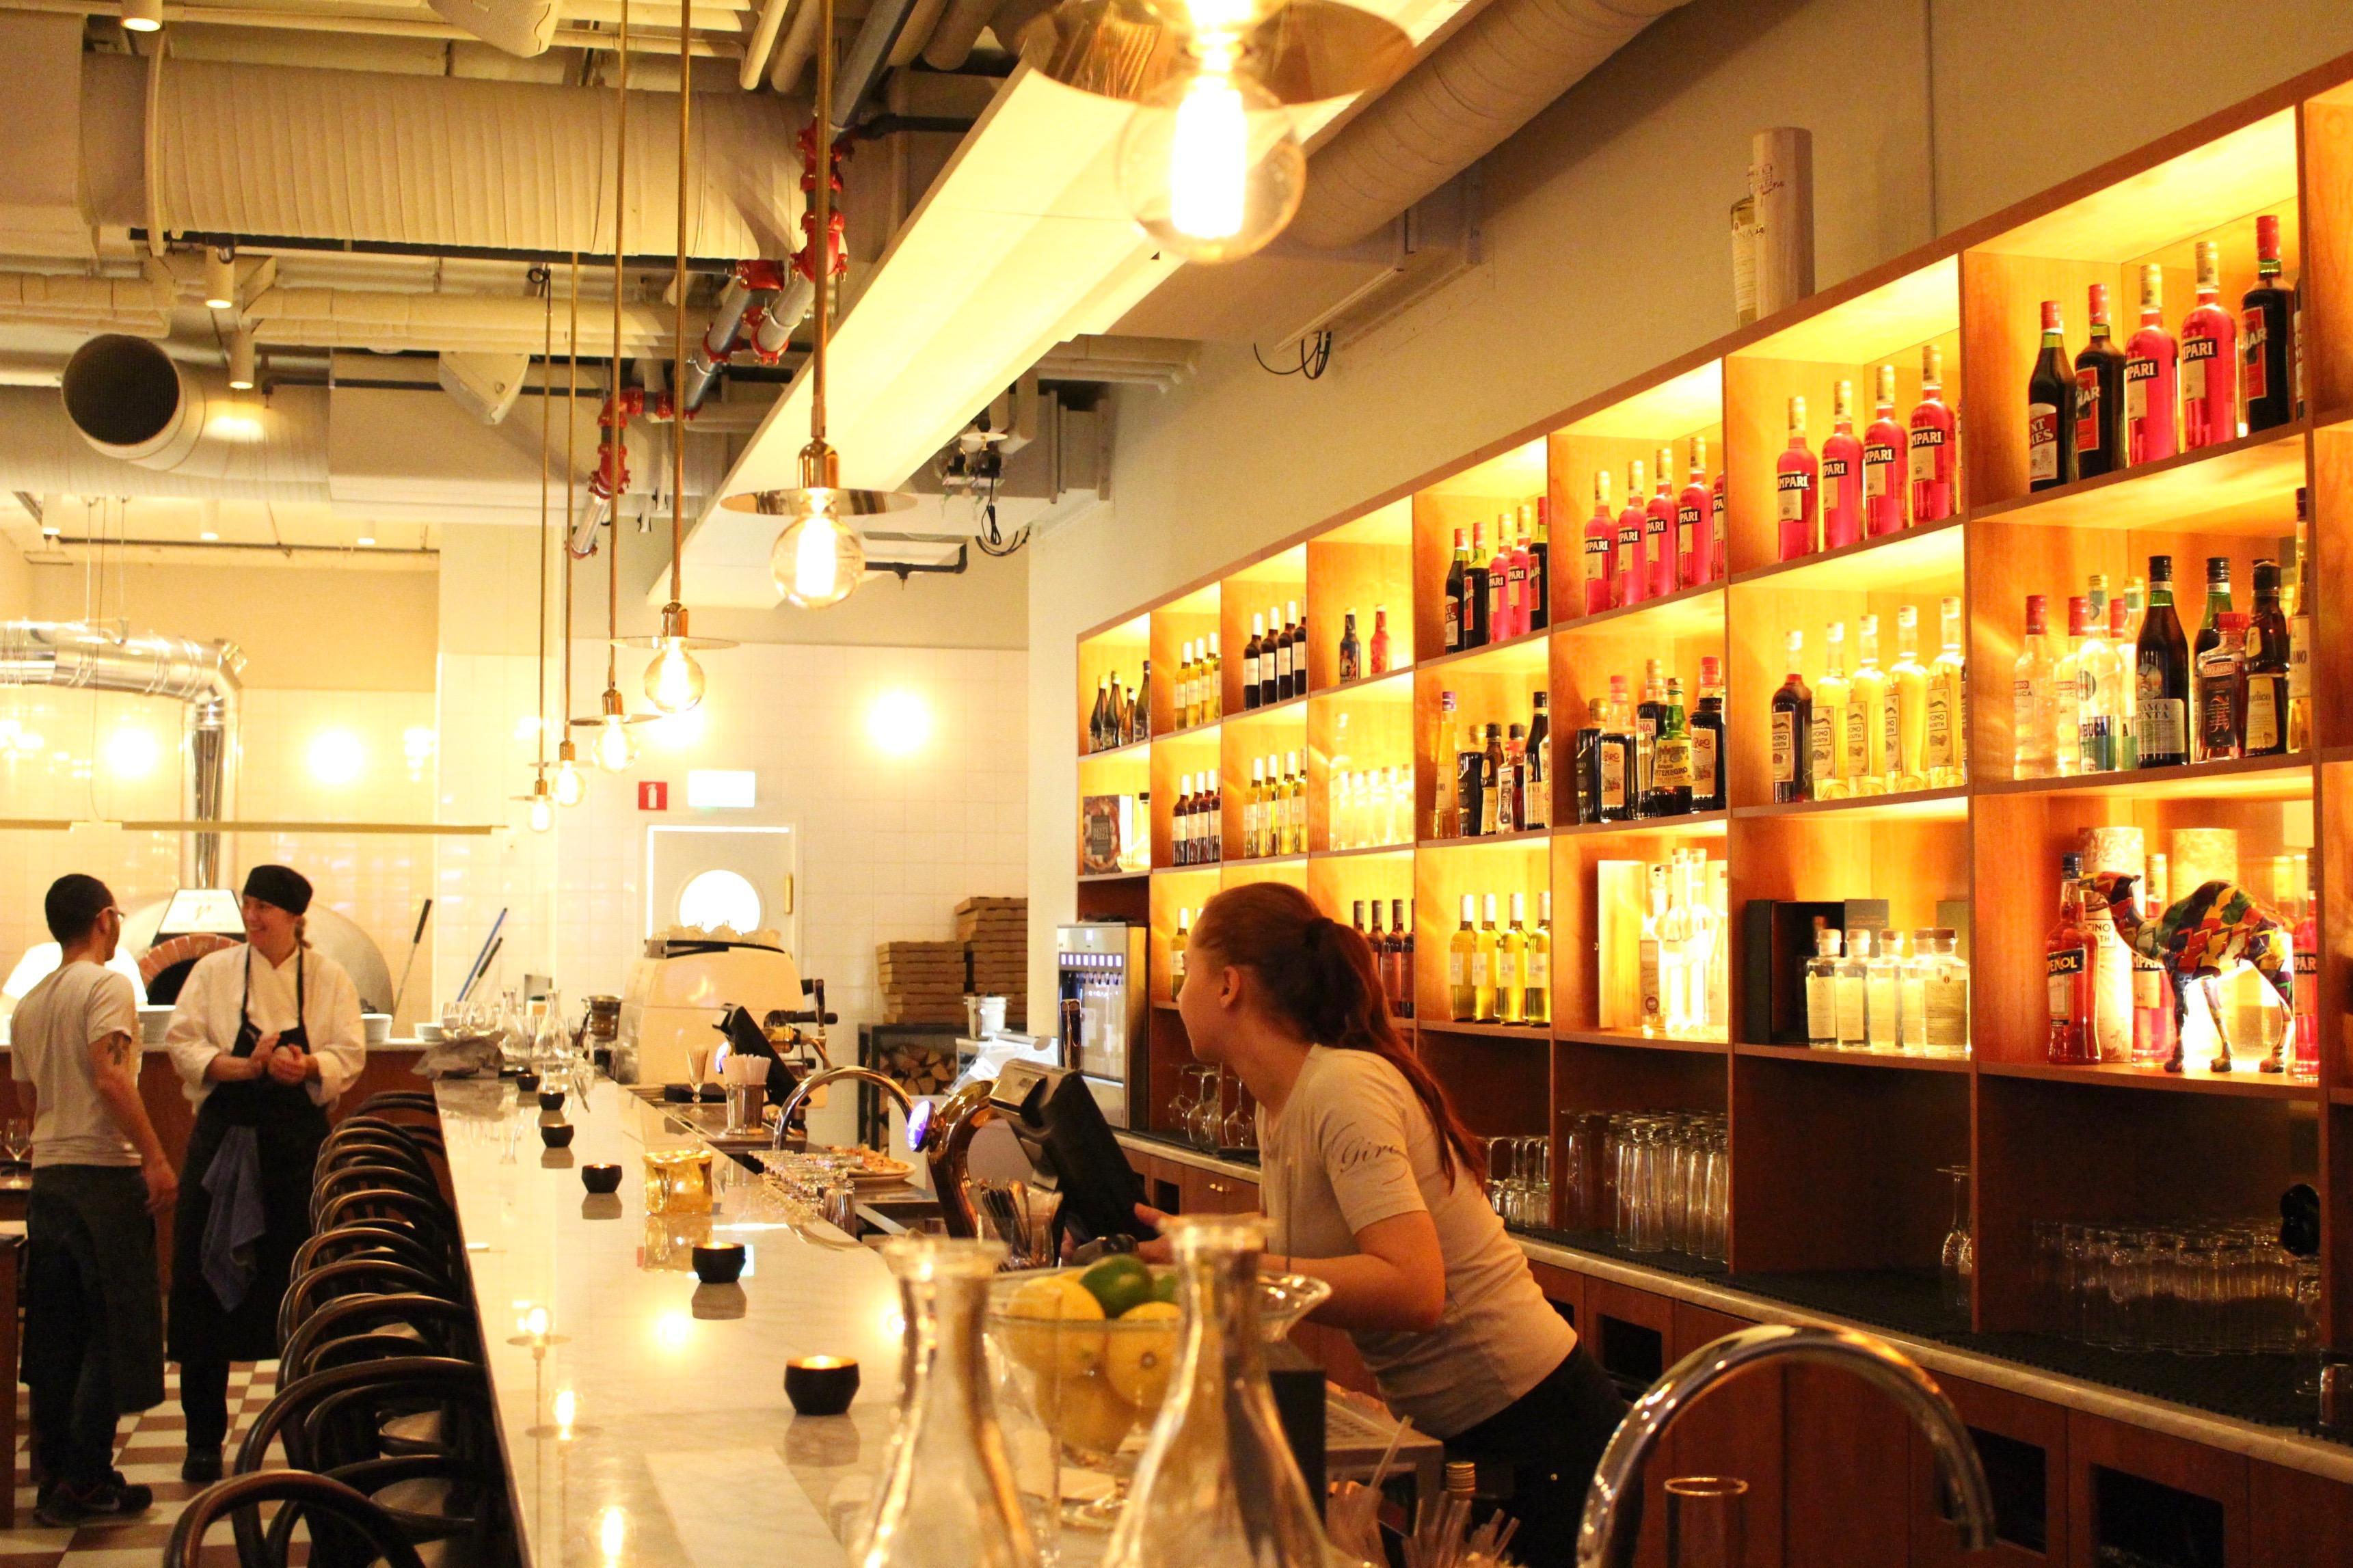 Giros Napoletanas bar